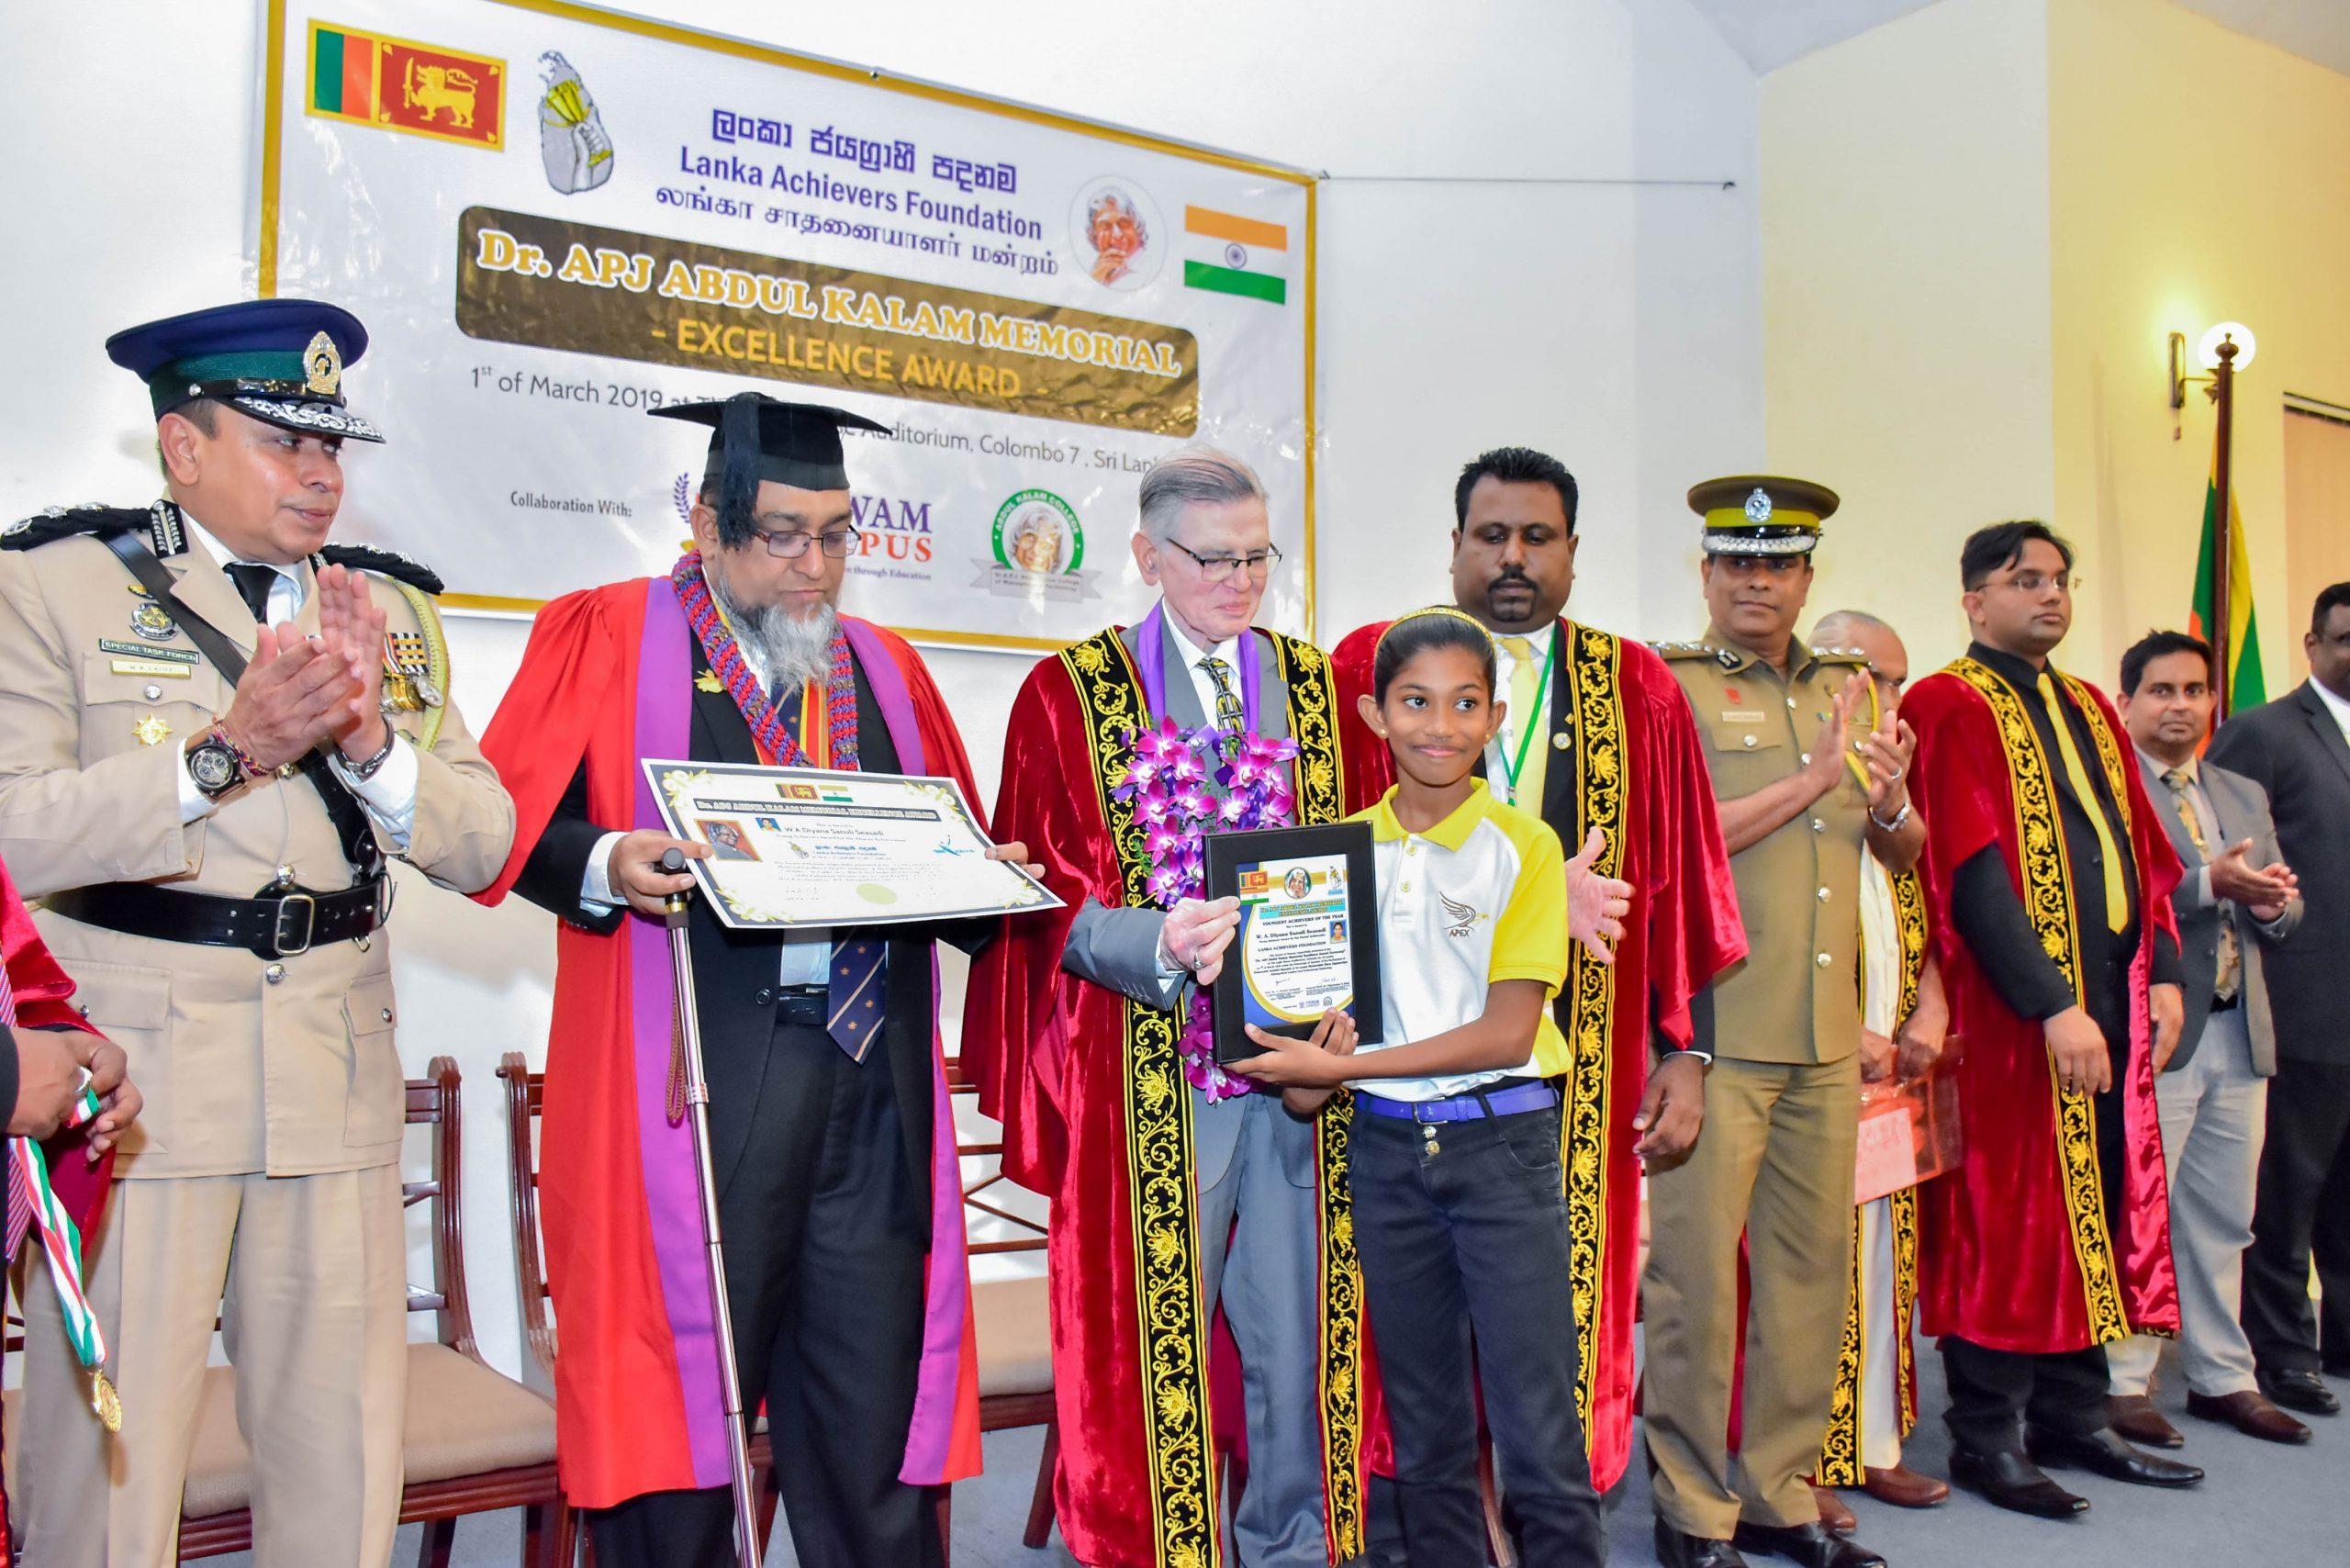 Dr. Abdul Kalam 2019 (9)